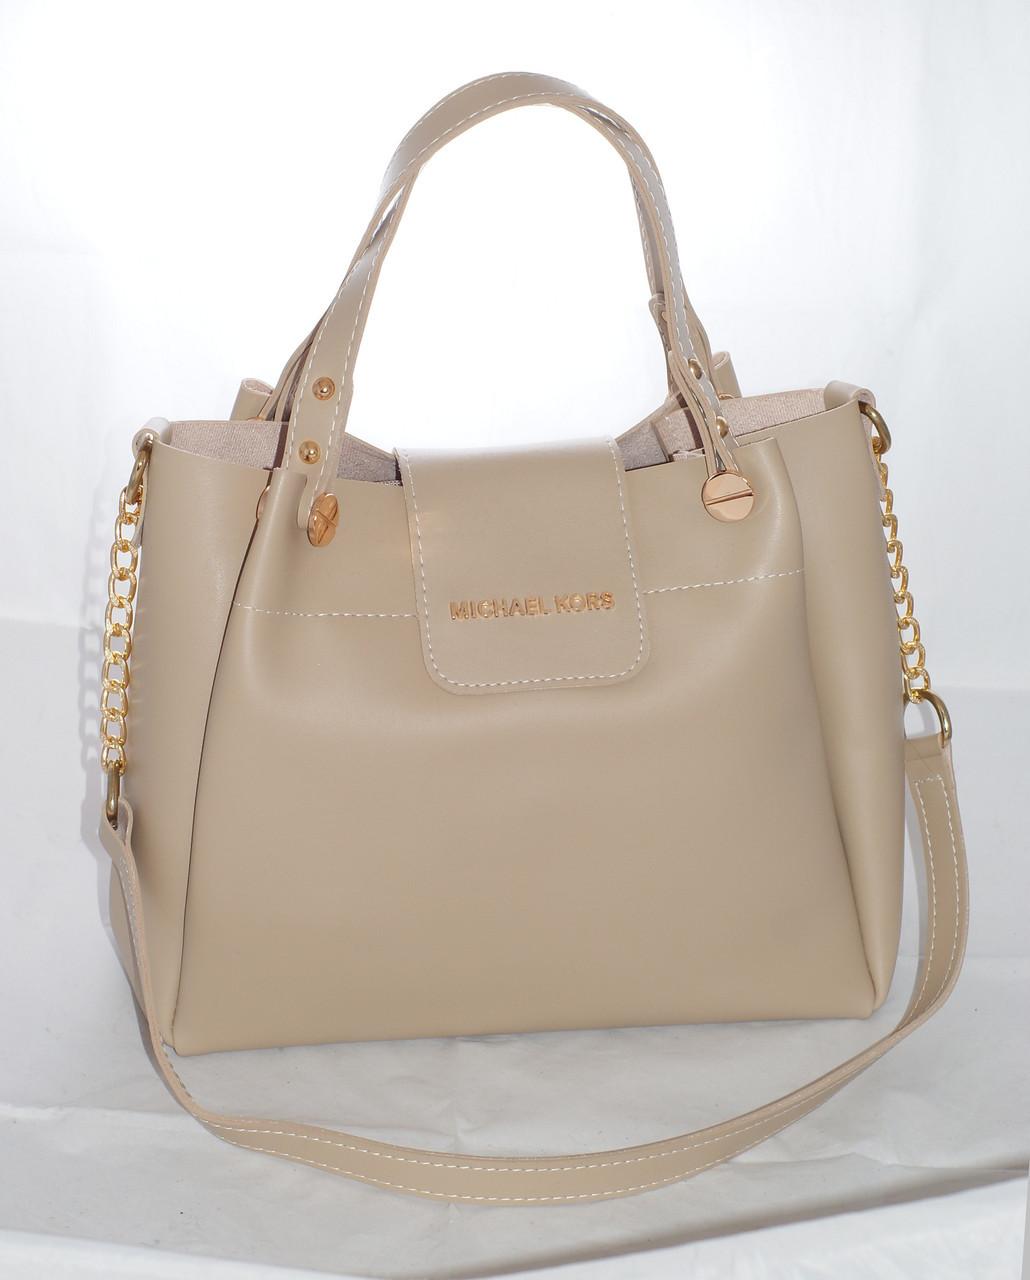 5882987e3961 Женская сумка Michael Kors (Майкл Корс), бежевая - Интернет-магазин